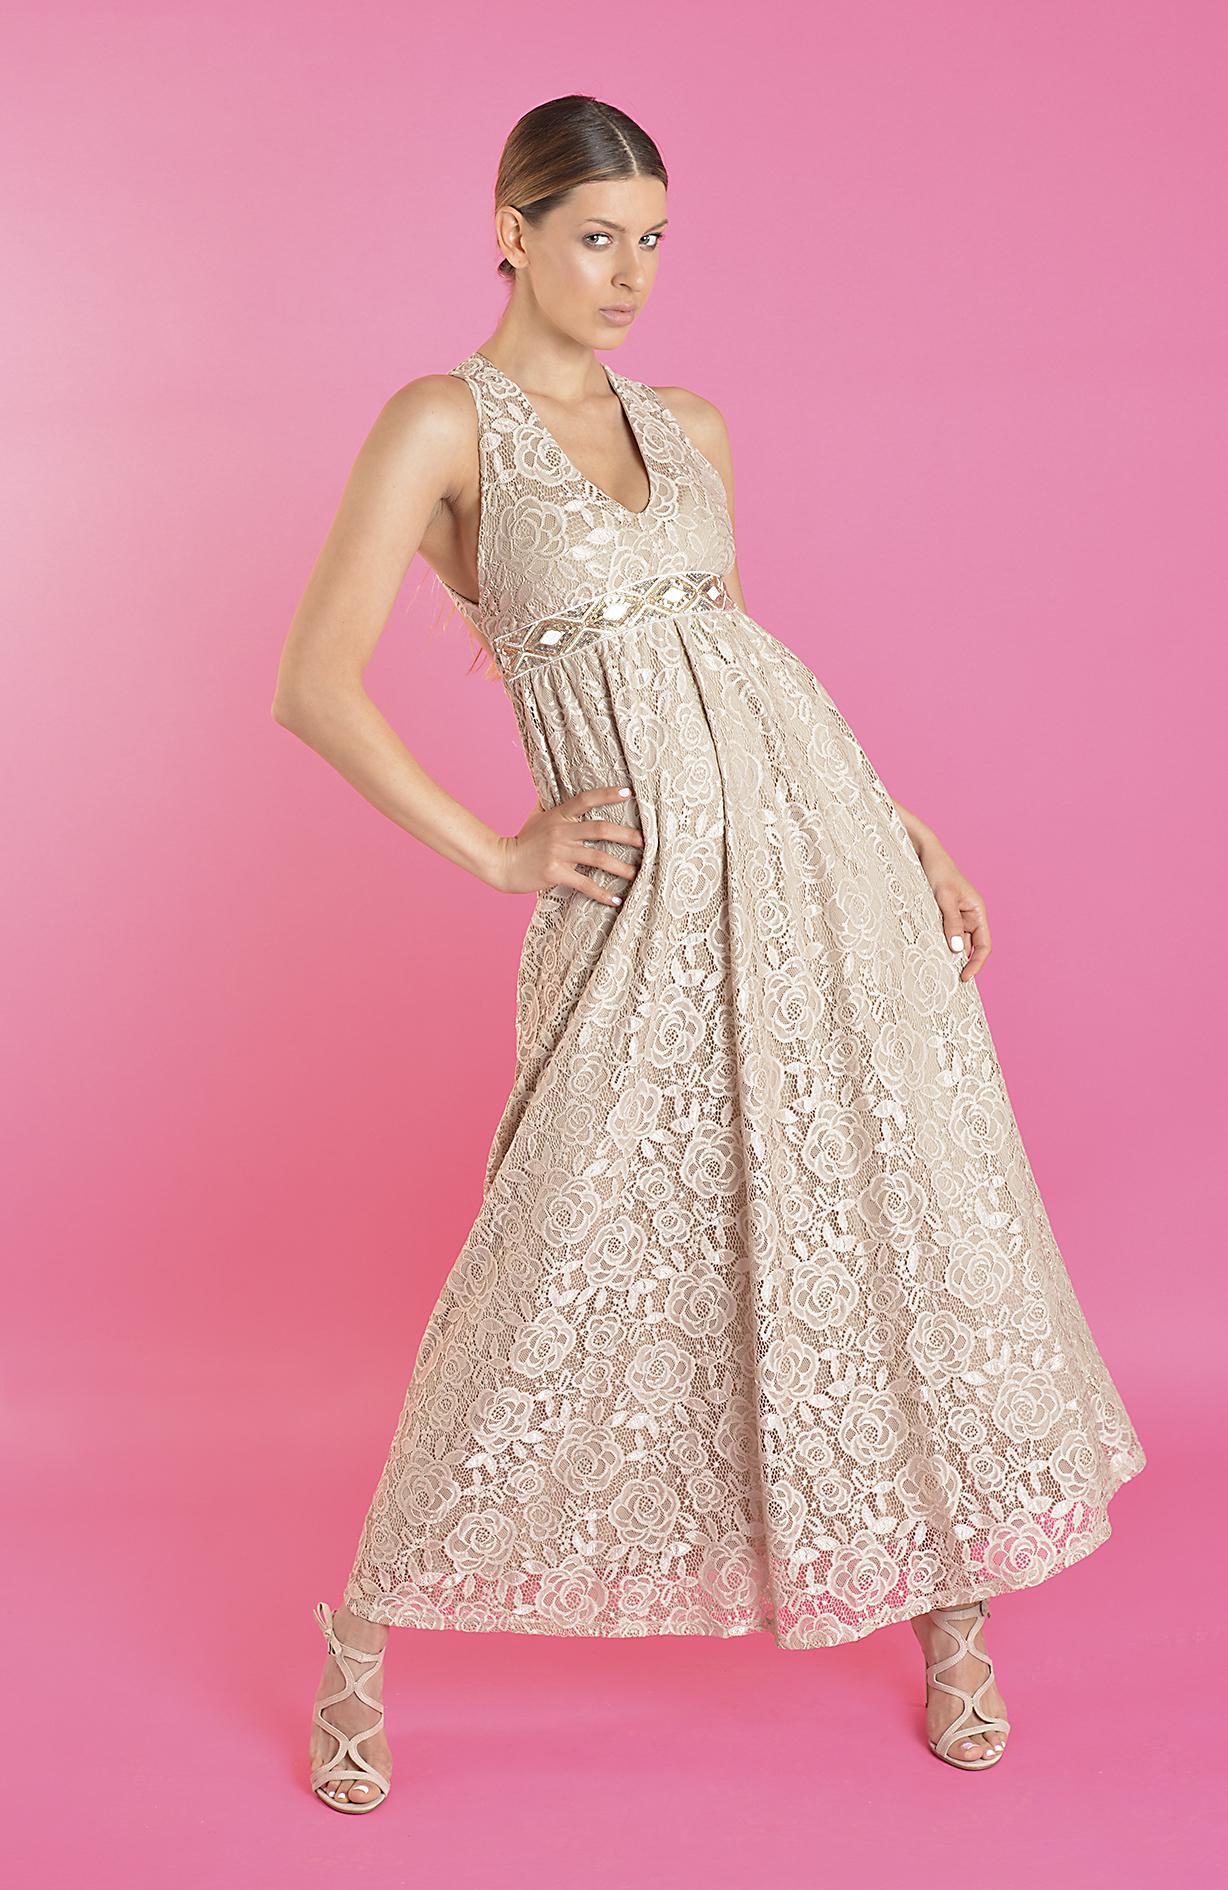 5ddd34c85d6e Δαντελένιο φόρεμα Paranoia Τιμή  67